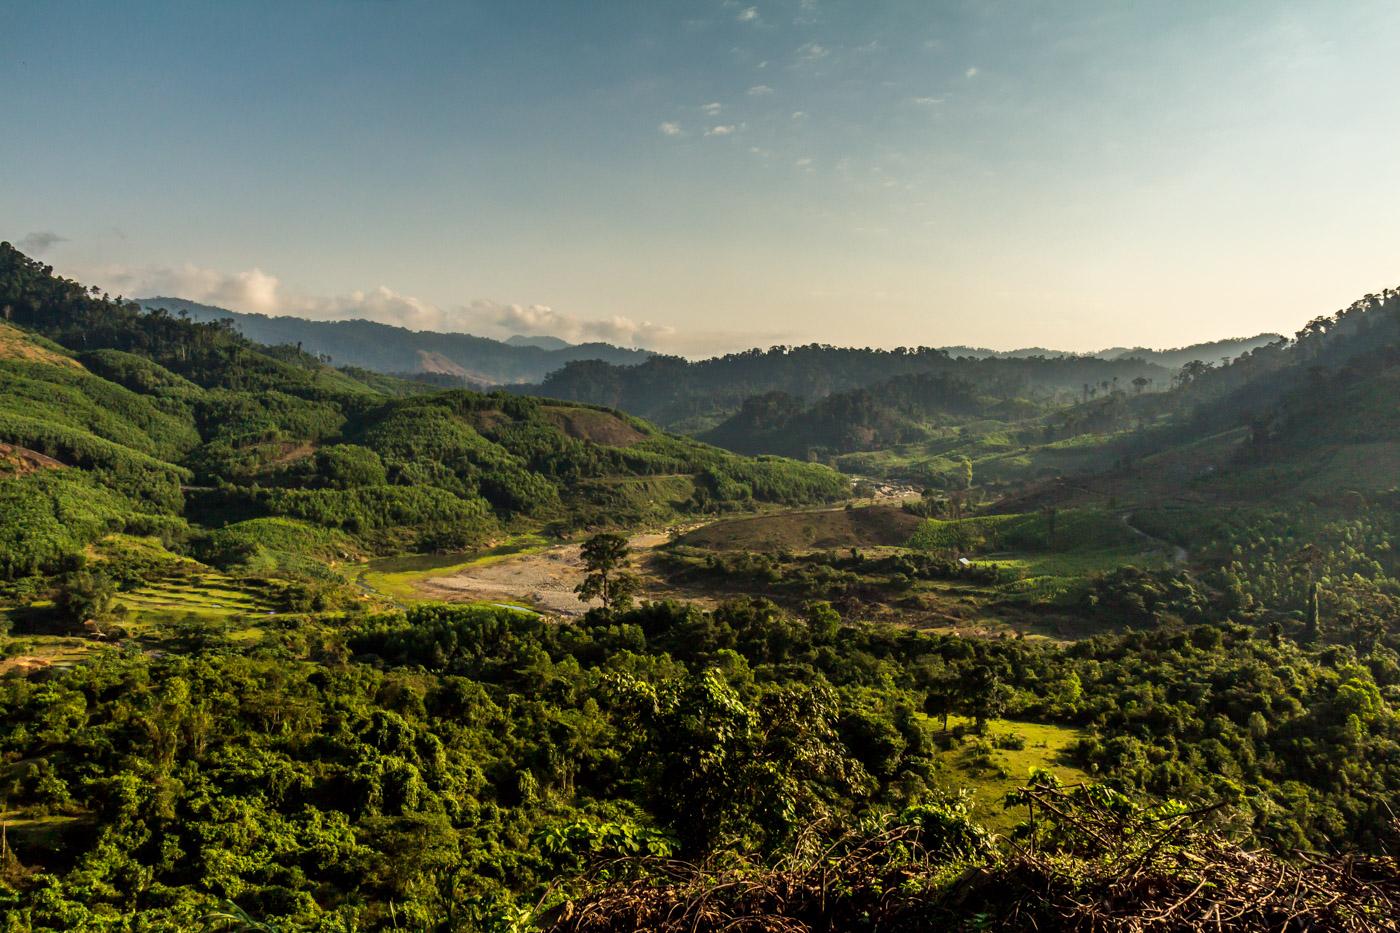 I passed through the hills surrounding Kham Duc.